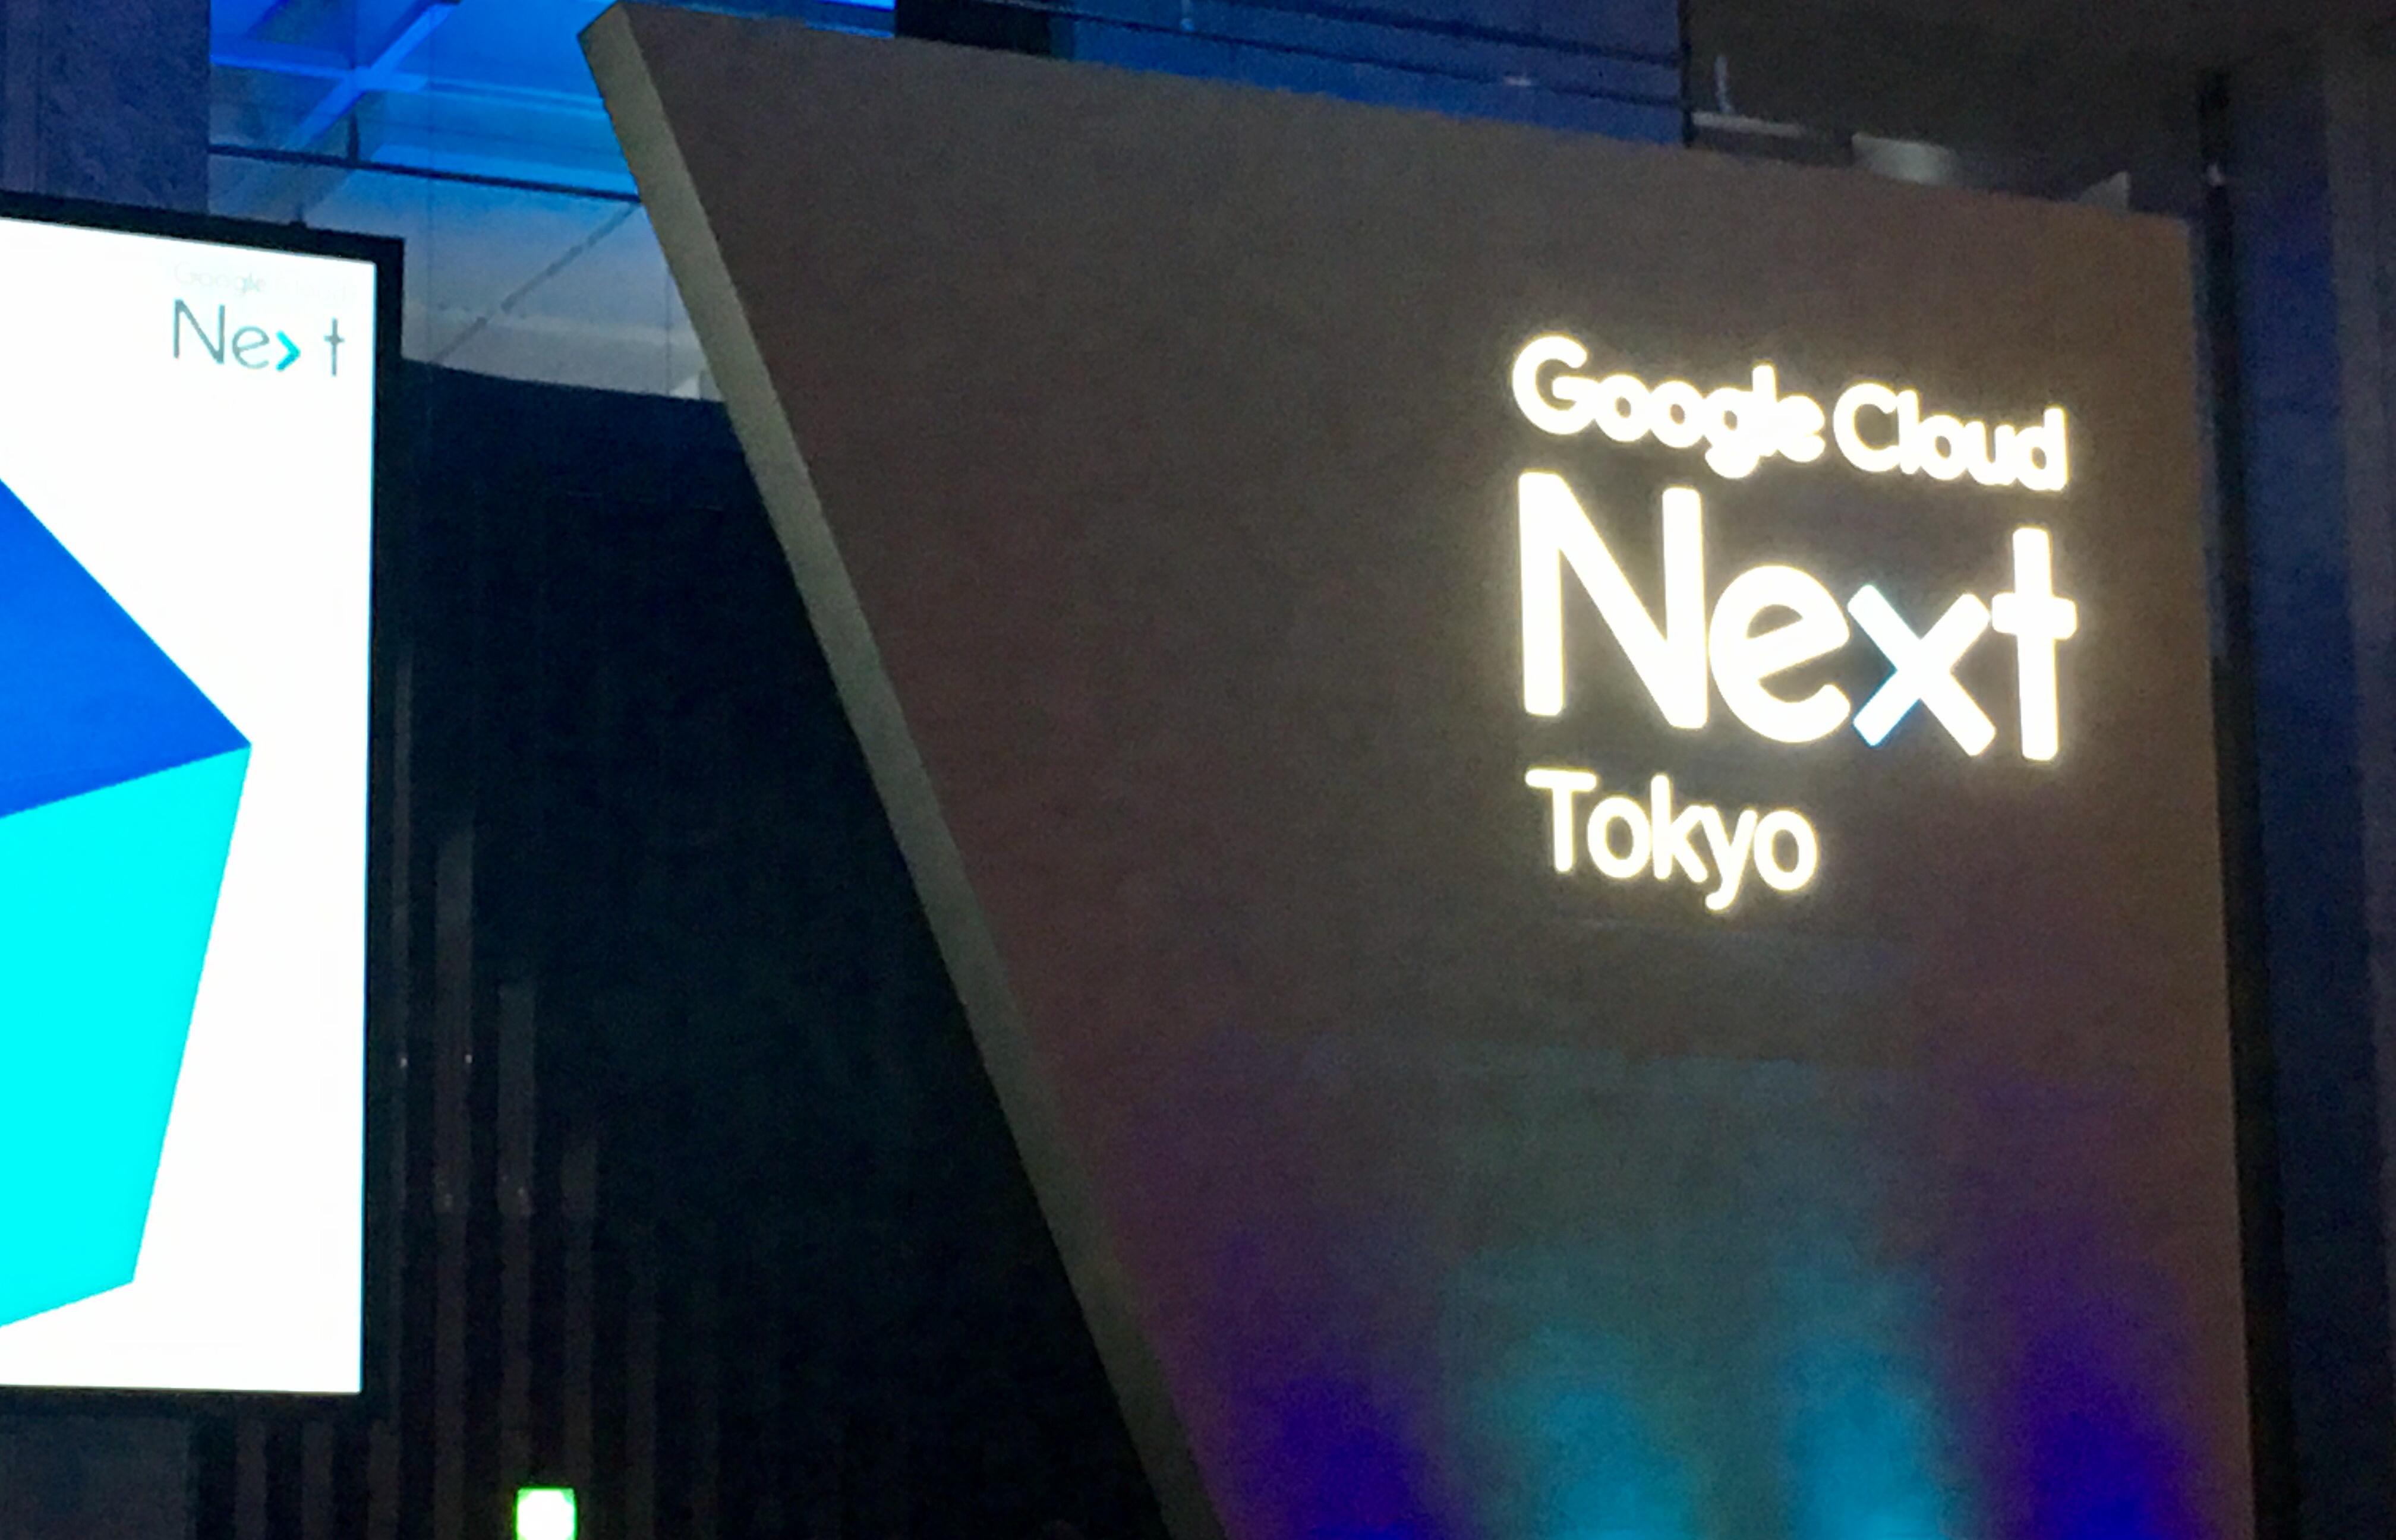 google cloud next 17 tokyo イーレンジャー株式会社